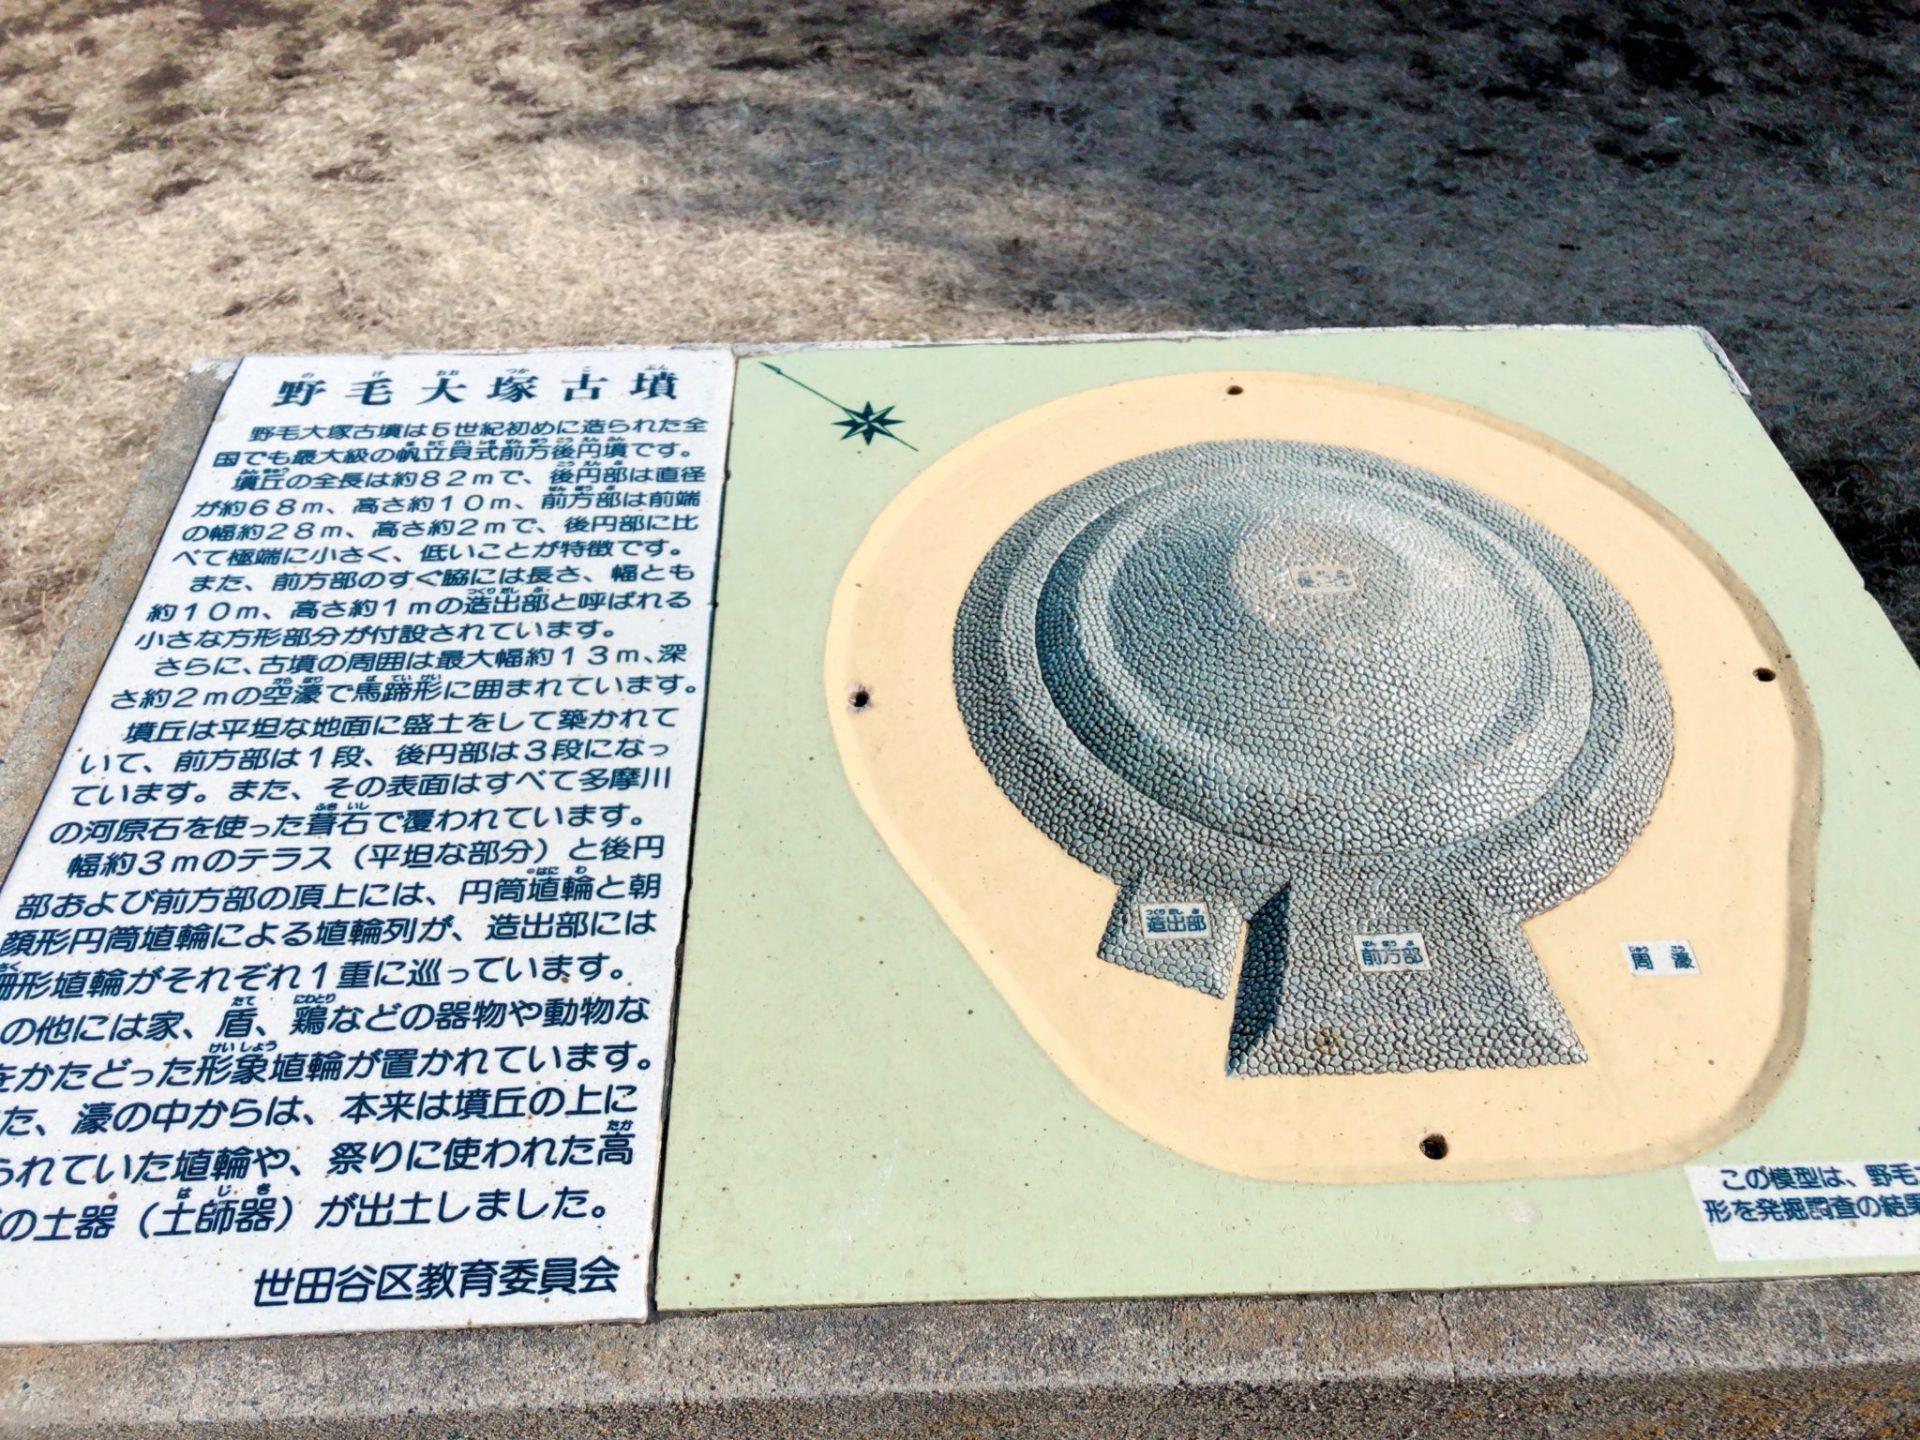 玉川野毛町公園の野毛大塚古墳は全国でも最大級の帆立貝式前方後円墳